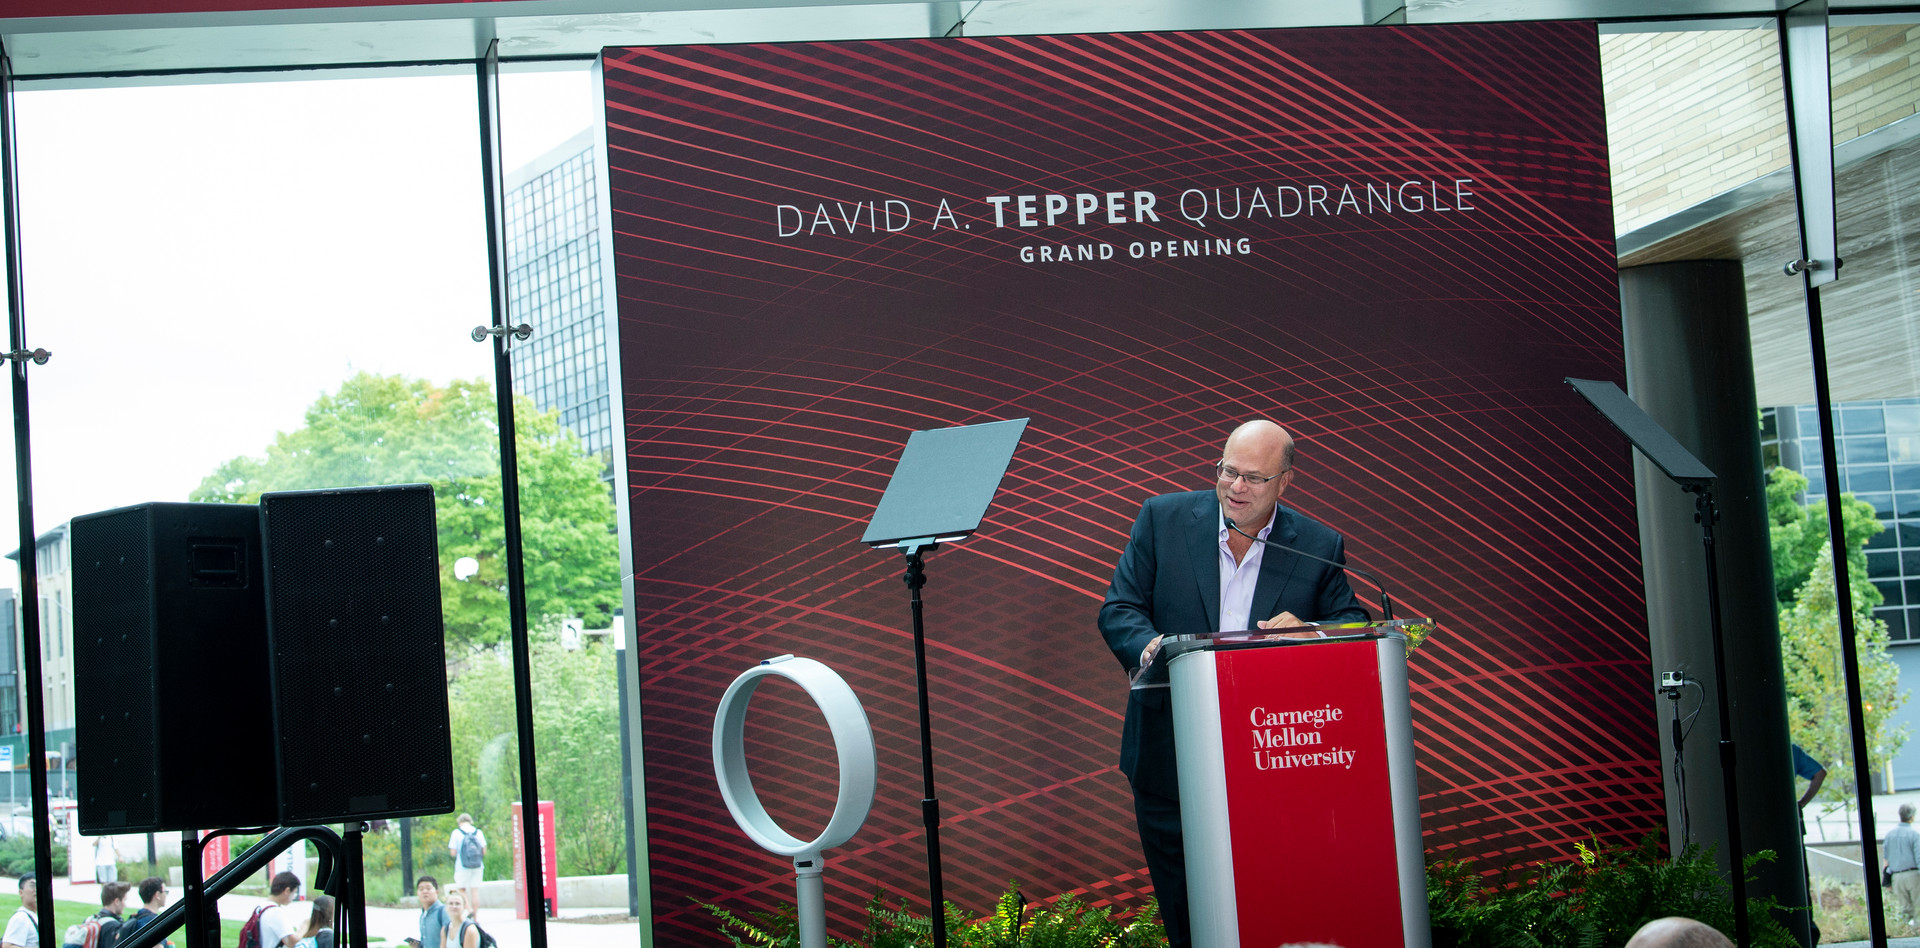 Tepper Quad Grand Opening David